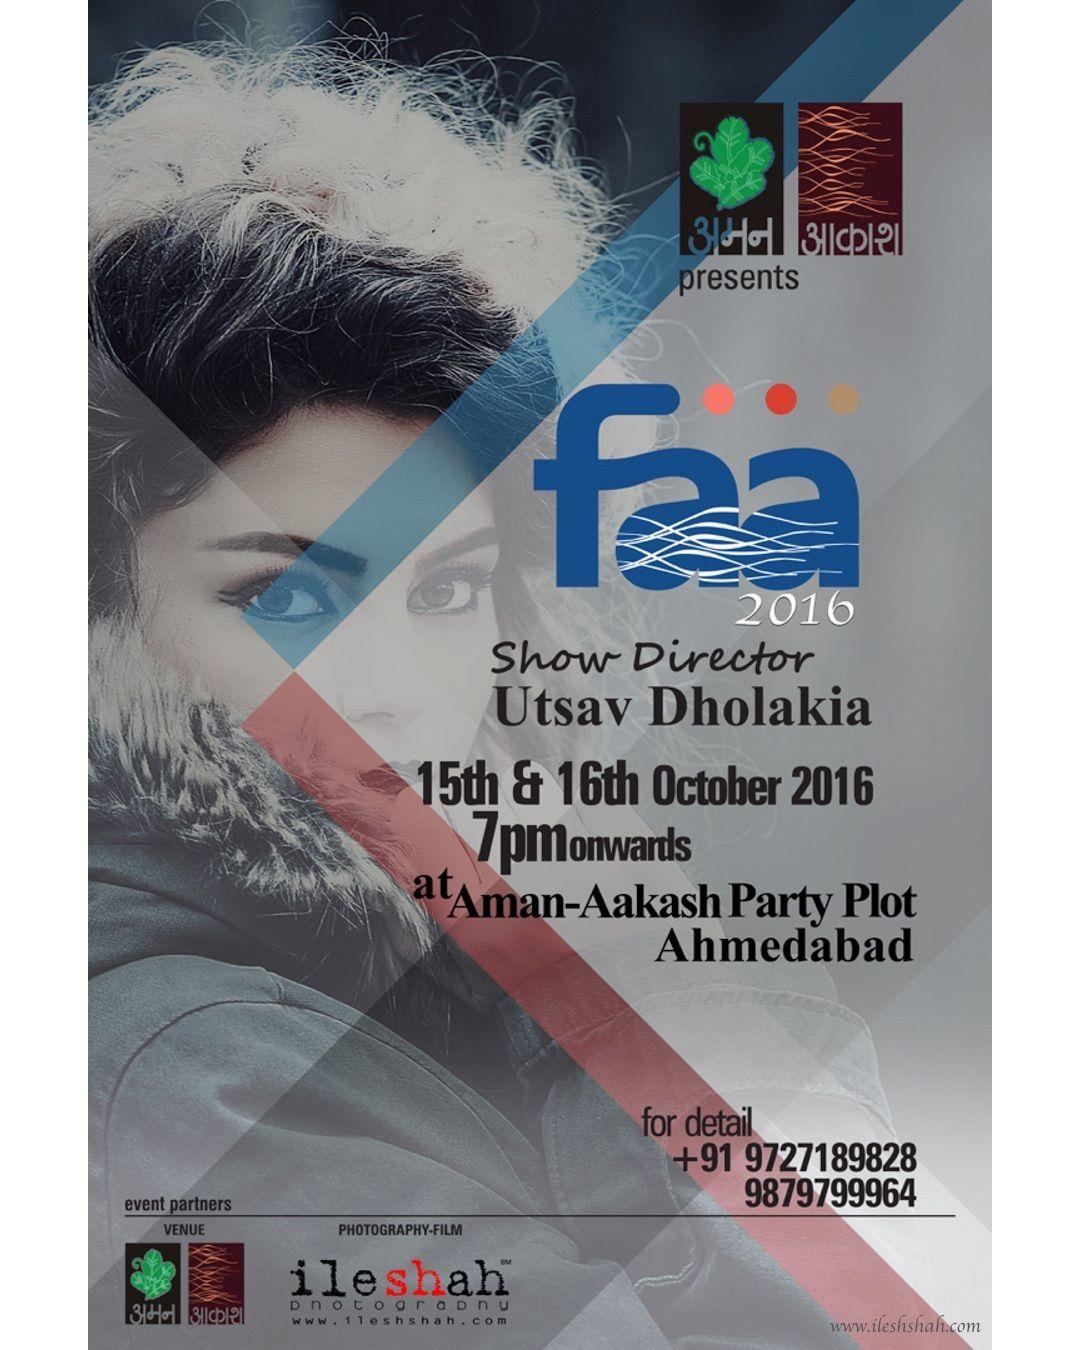 faa 2016   Ahmedabad   http://ift.tt/2be7WZM #ilesh #ileshshahphotography #www.ileshshah.com #ahmedabad #gujarat #india #twitter #pin #utsavdholakia #show #fashion#ootd #ootn #outfitoftheday #wiw #whatiwore #instastyle #todayimwearing #style #styleiswhat